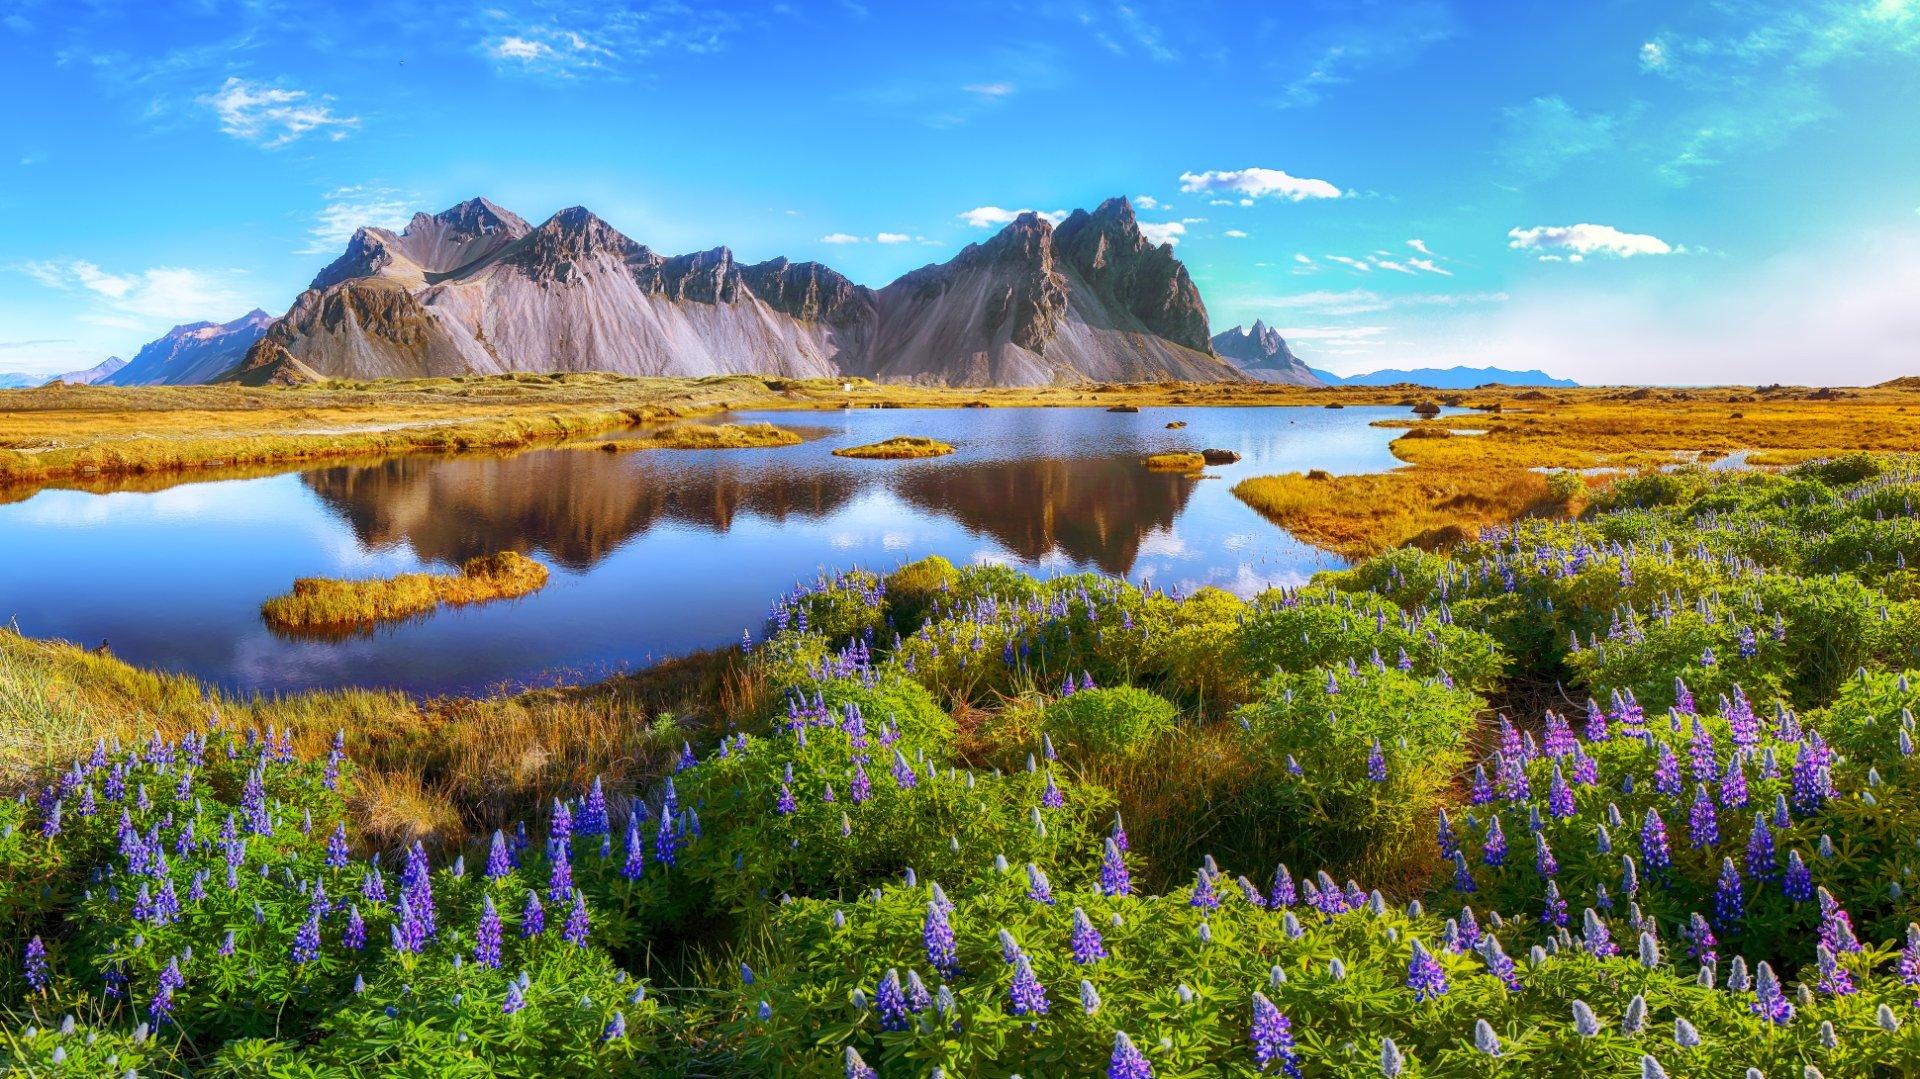 ISLANDIA A TU AIRE (ESCAPADA A REYKJAVIK)